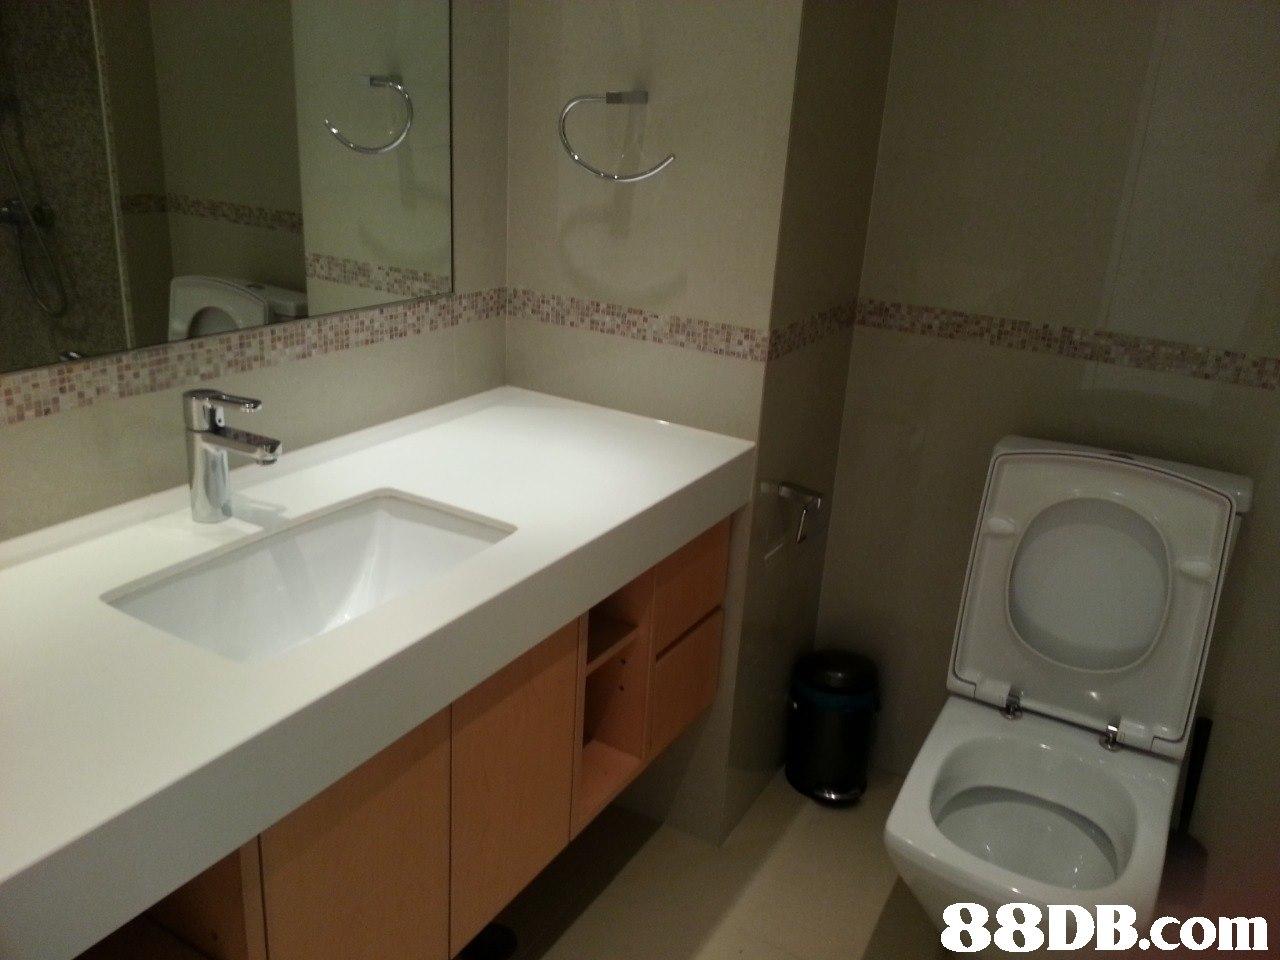 property,bathroom,room,sink,toilet seat